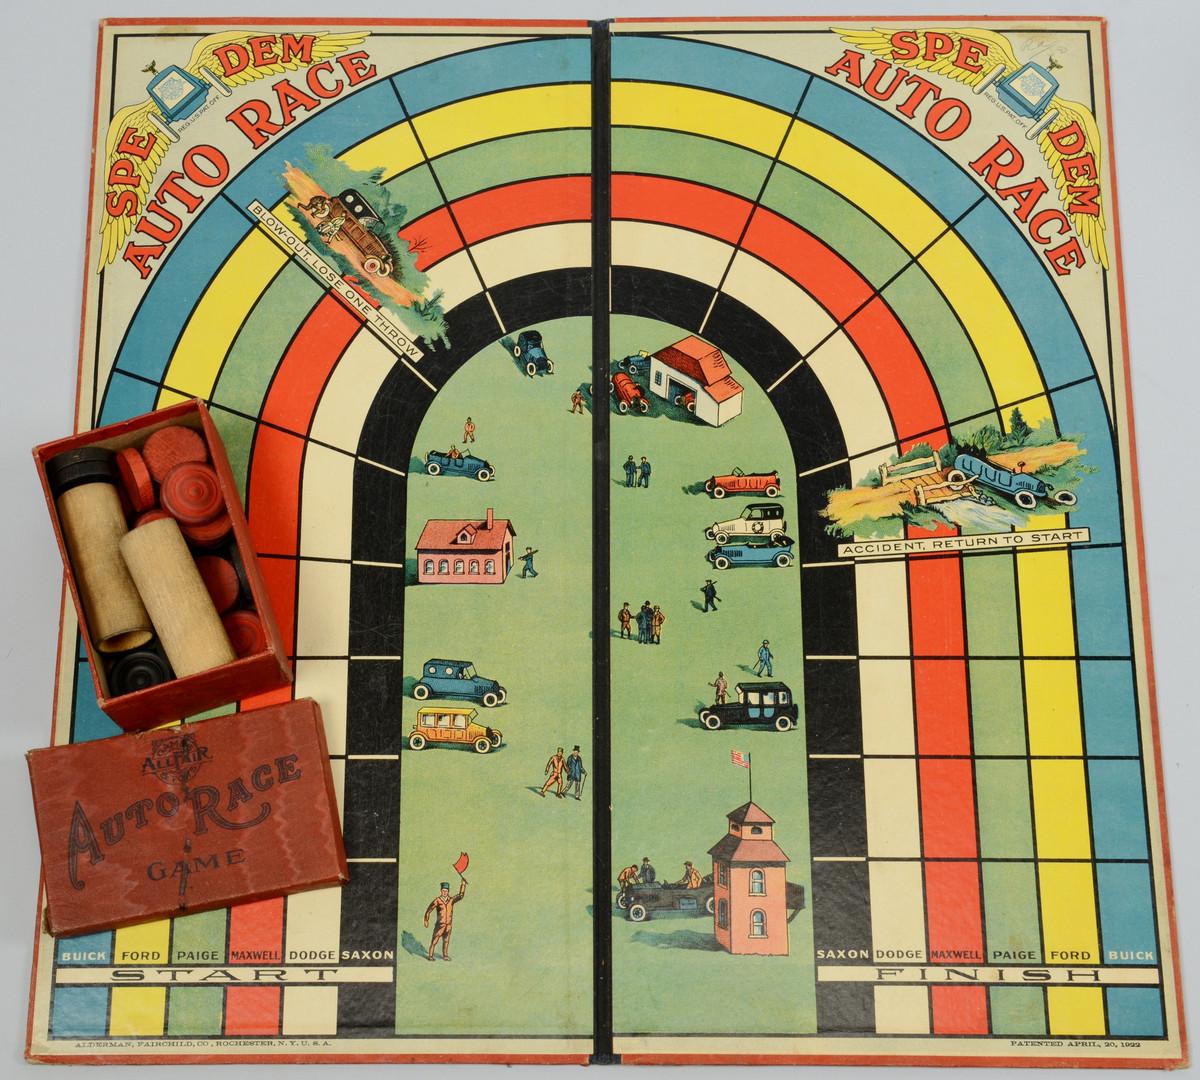 Lot 751: Large Group of Vintage Games